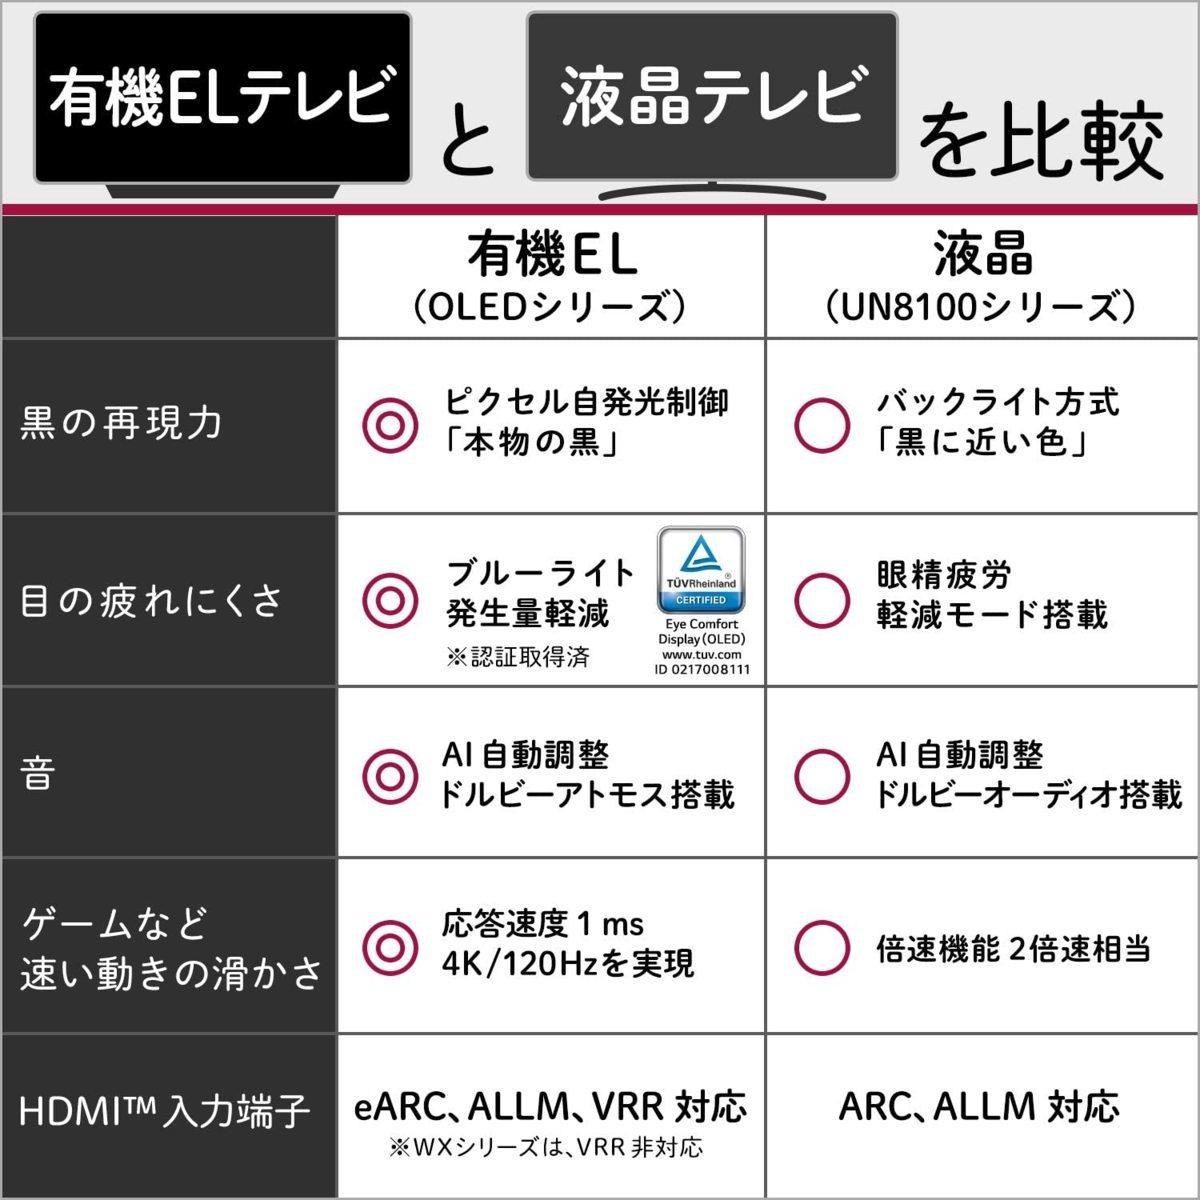 LG 55V型 4Kチューナー内蔵有機ELテレビ OLED55BXPJA 無線LAN/Bluetooth/Dolby Atmos/YouTube/Amazonプライム/Netflix 2021/4から1年保証_画像6